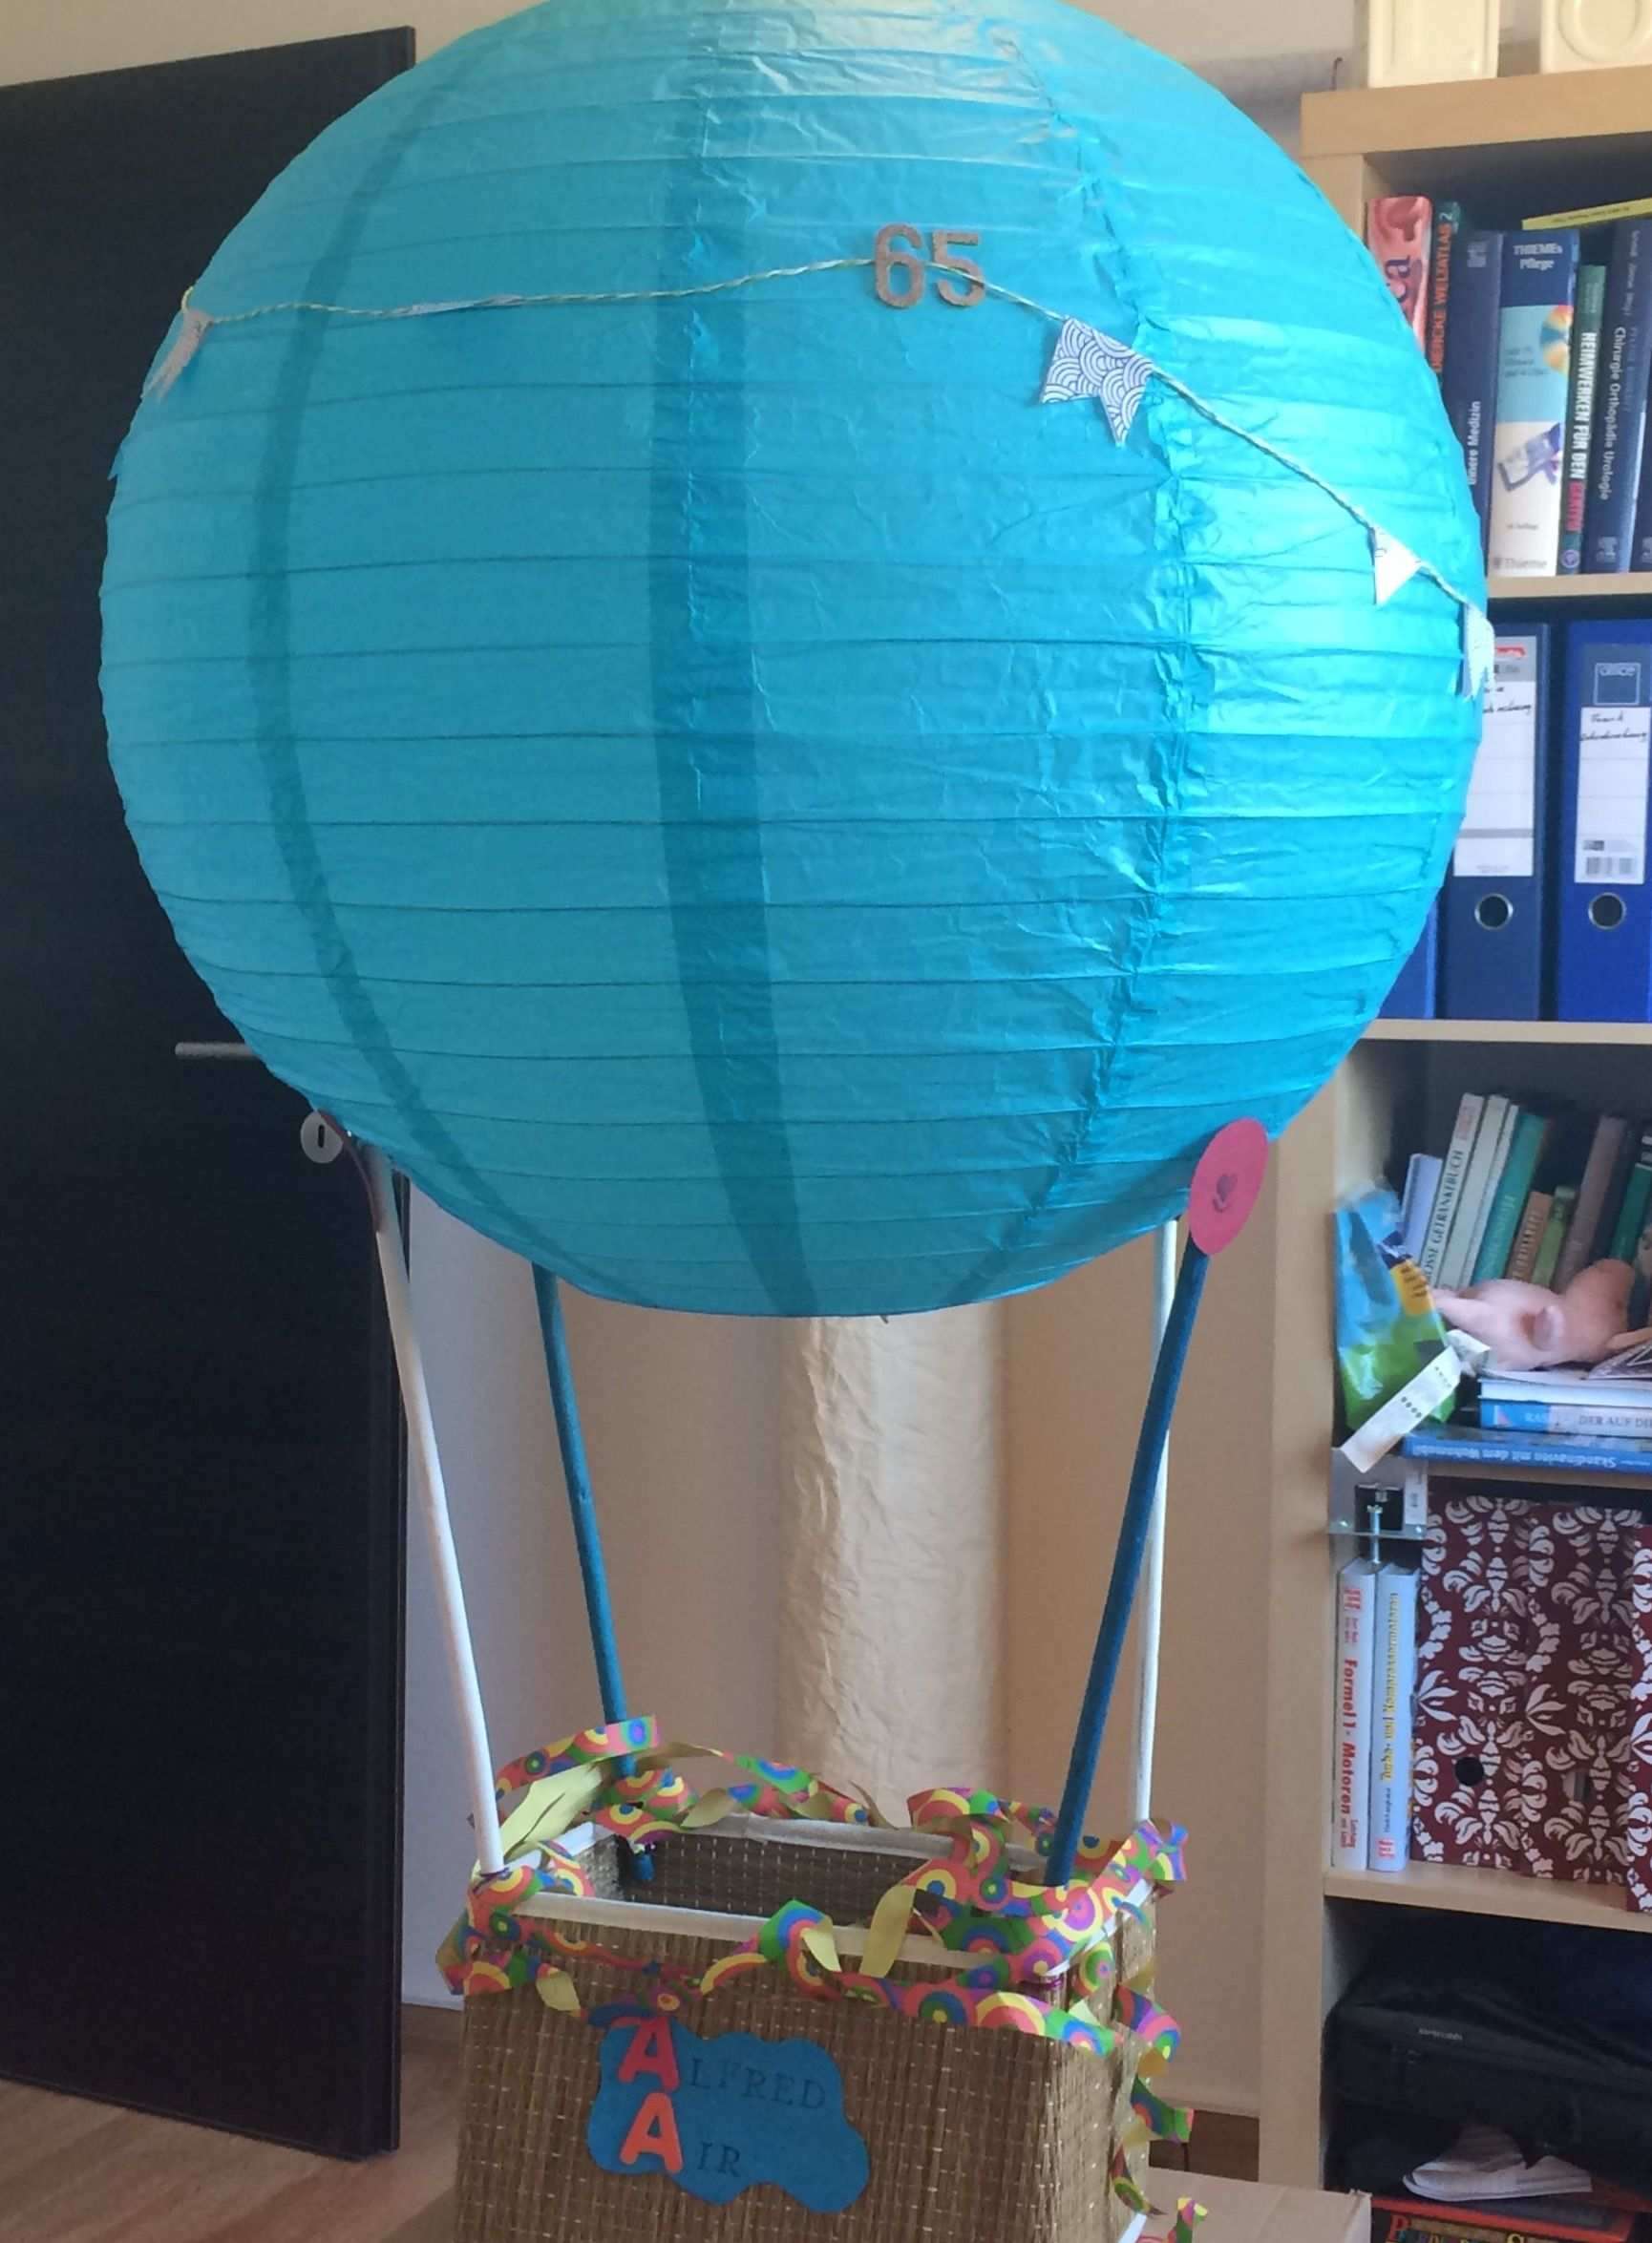 Diy Geburtstagsgeschenk Gutschein Ballonfahrt Ballonfahrt